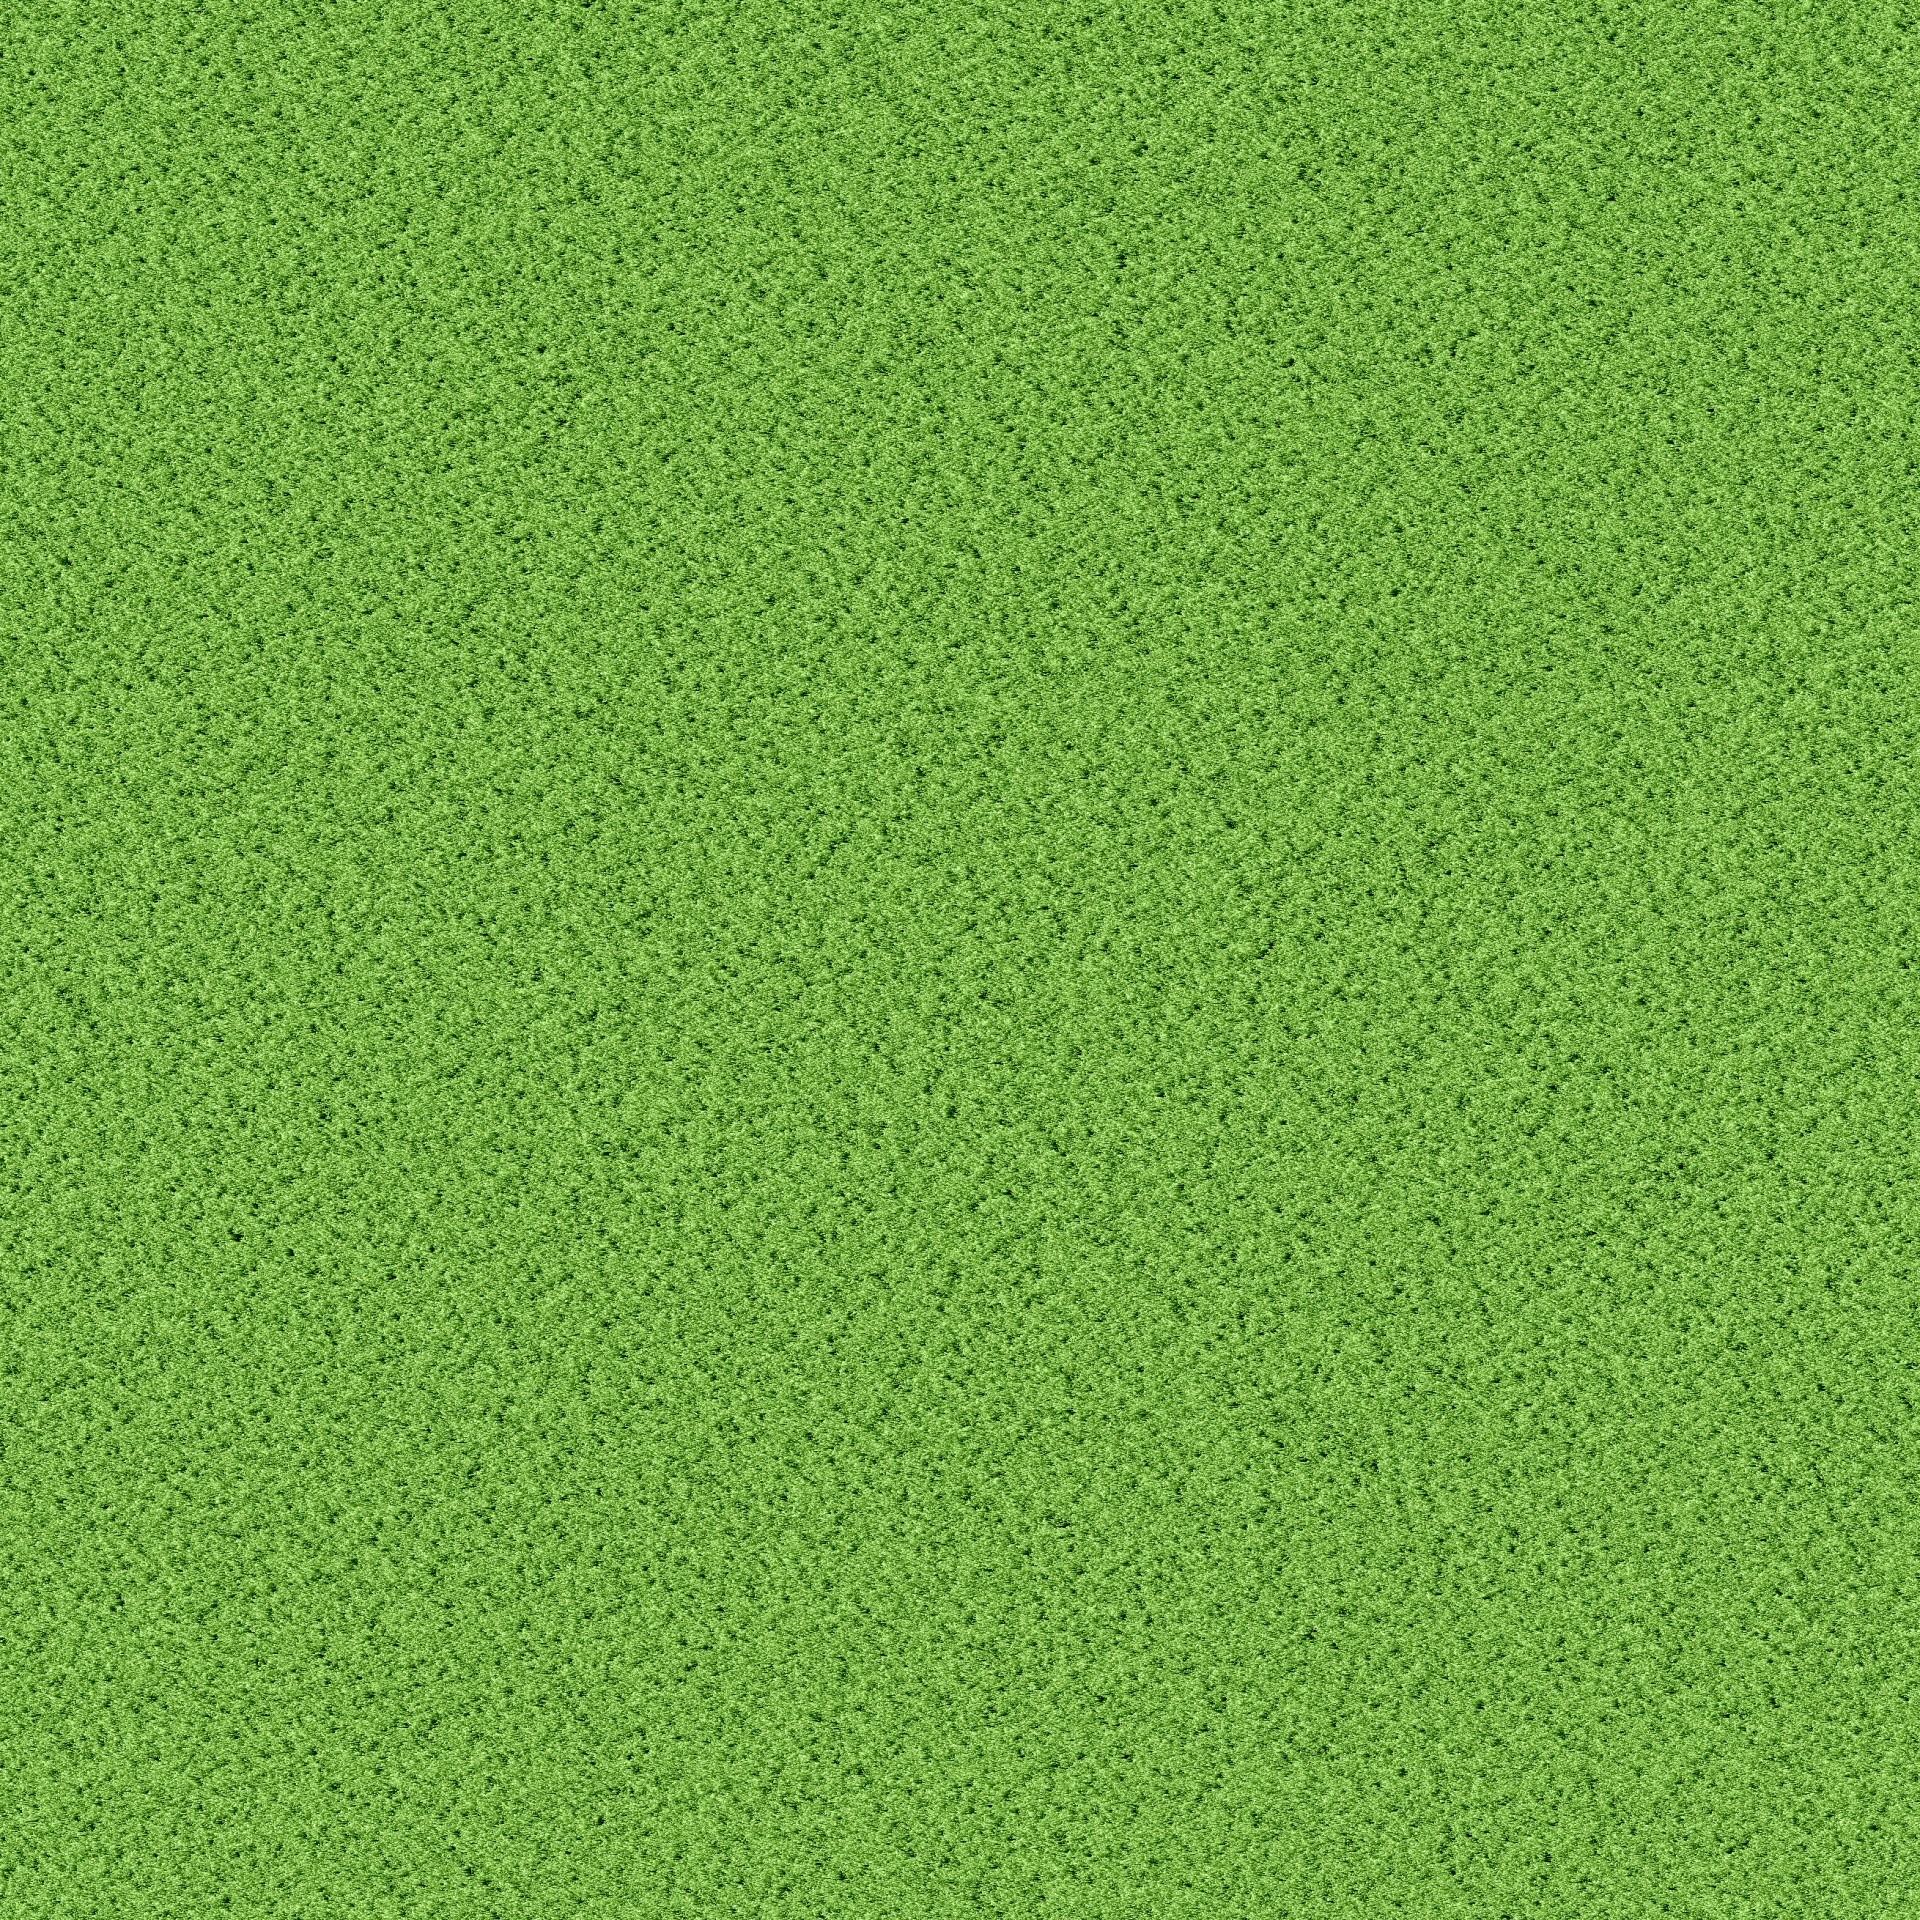 gambar menanam bidang halaman rumput tekstur daun aspal hijau tanah seni latar belakang padang rumput kertas dinding lantai rumput sintetis keluarga rumput 1920x1920 1341108 galeri foto pxhere https pxhere com id photo 1341108